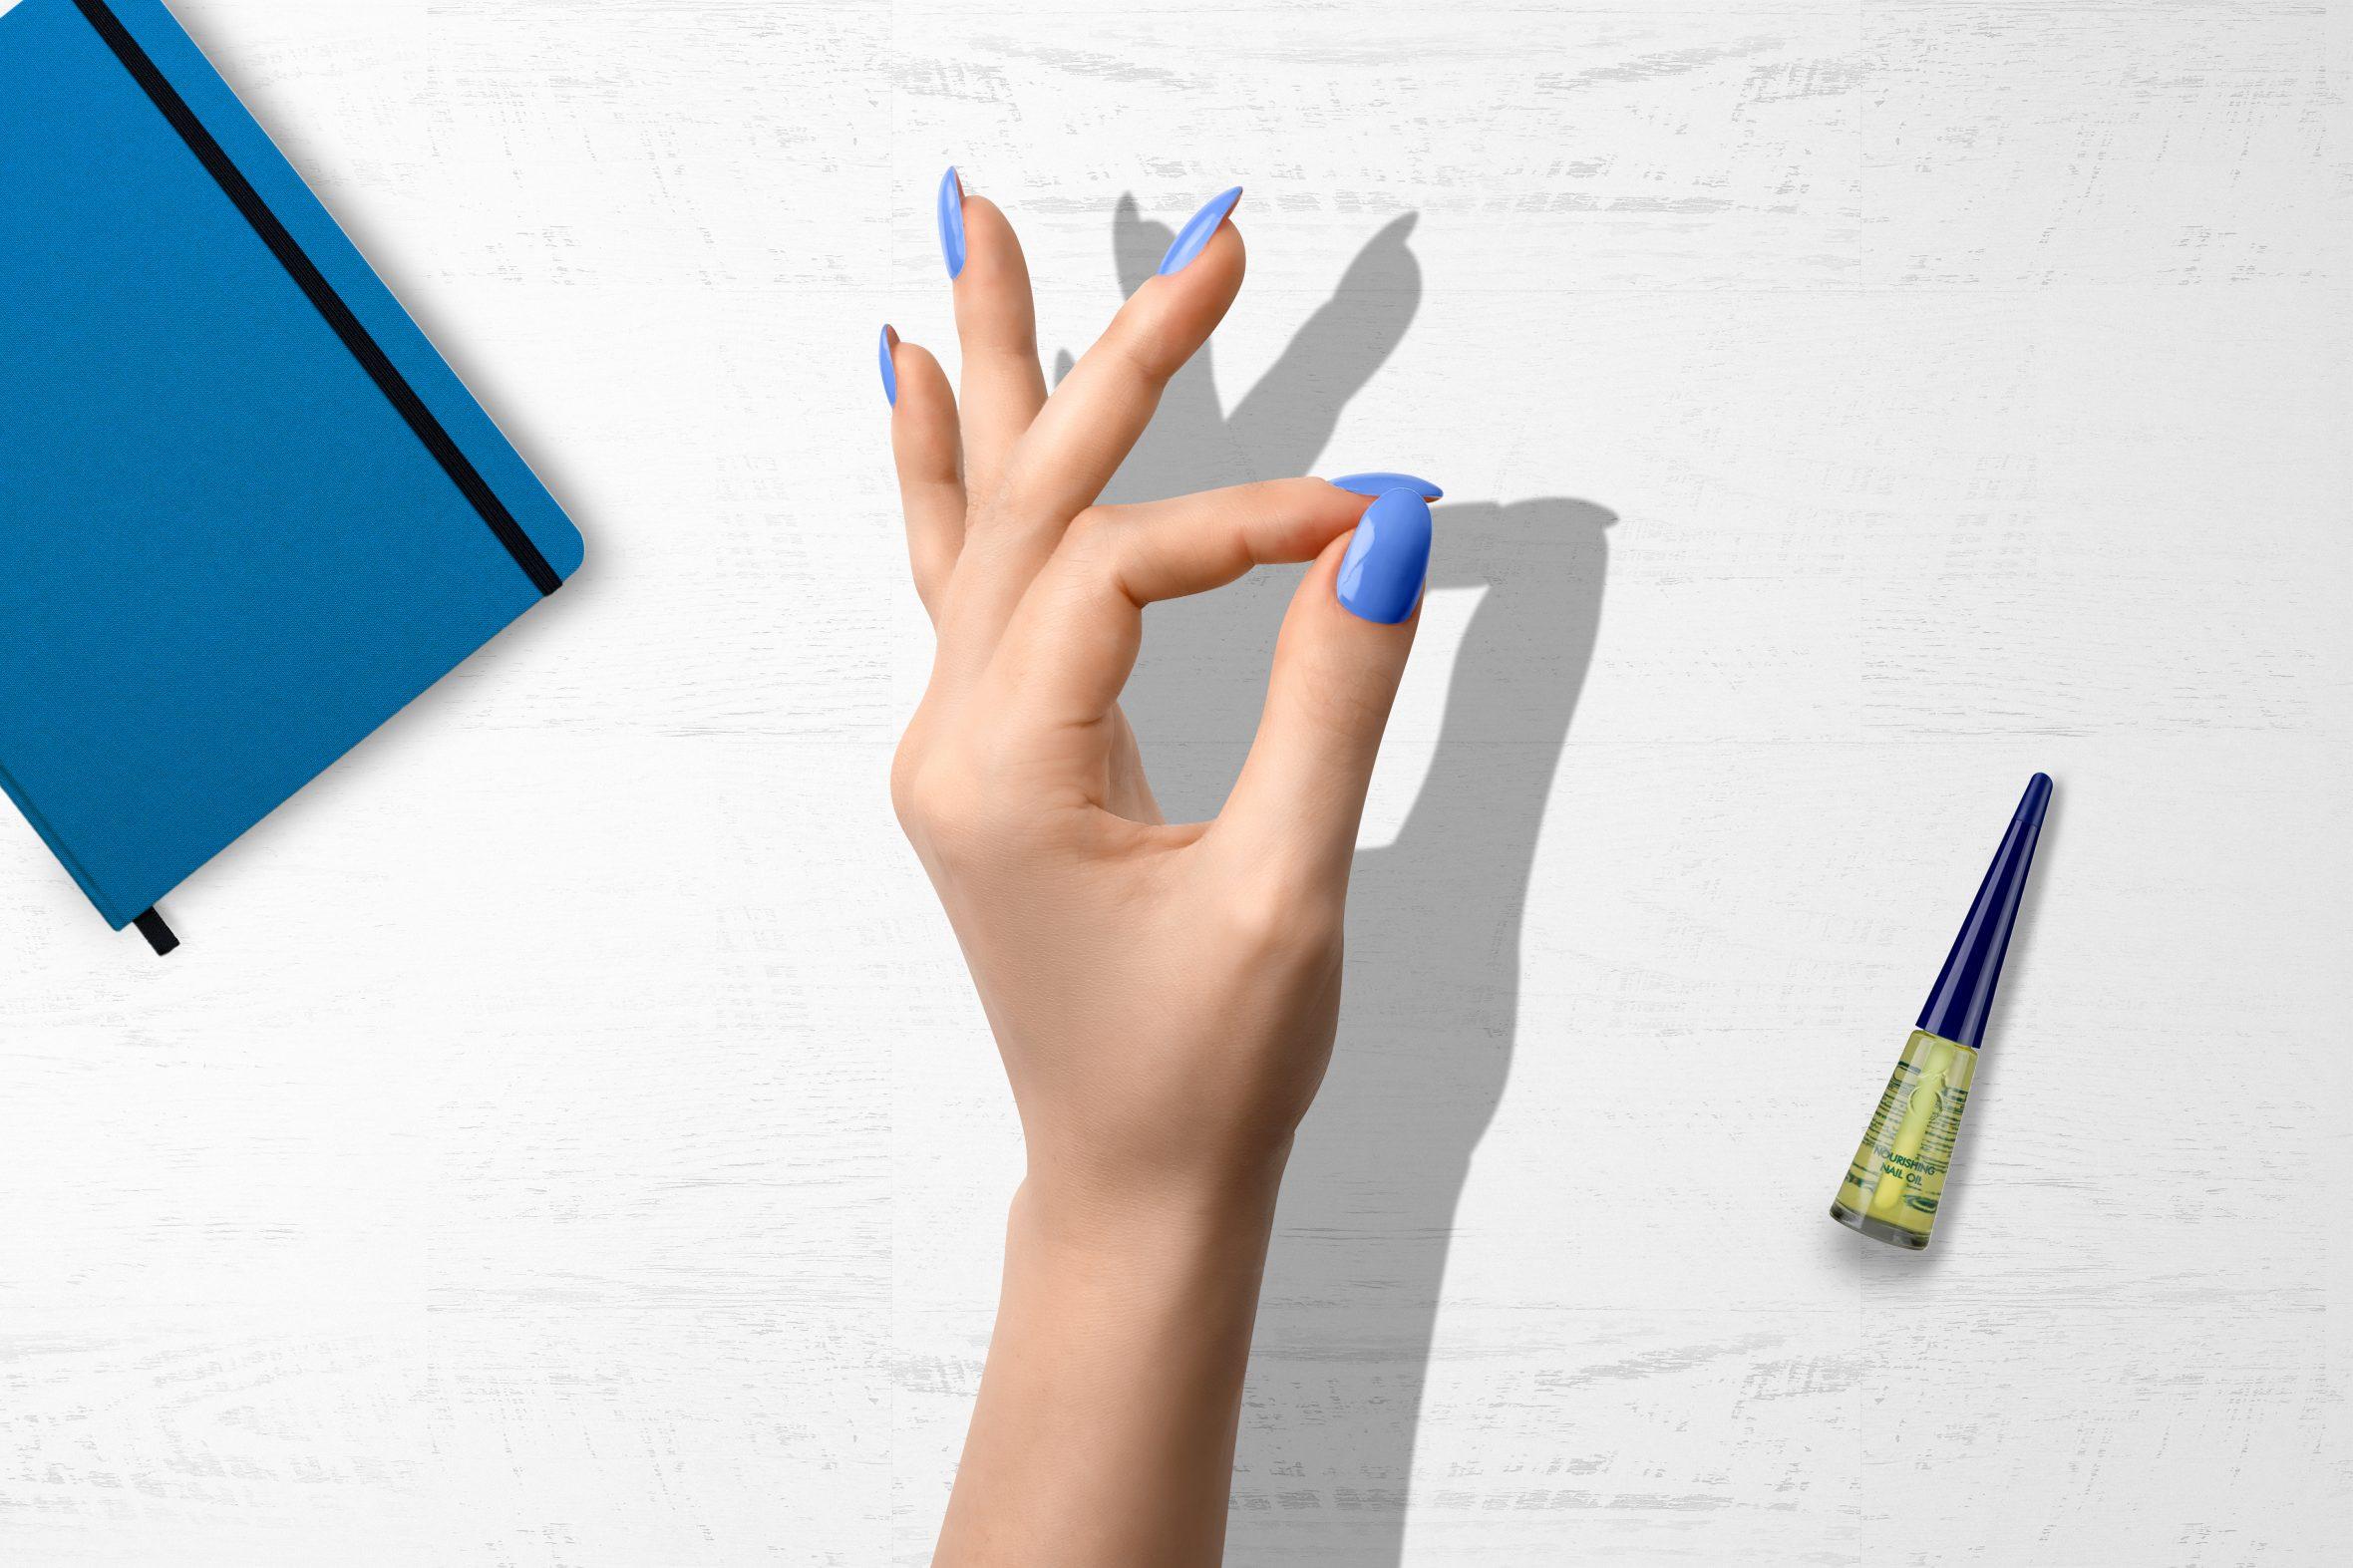 Hemelsblauwe nagellak kleur voor mooie manicure